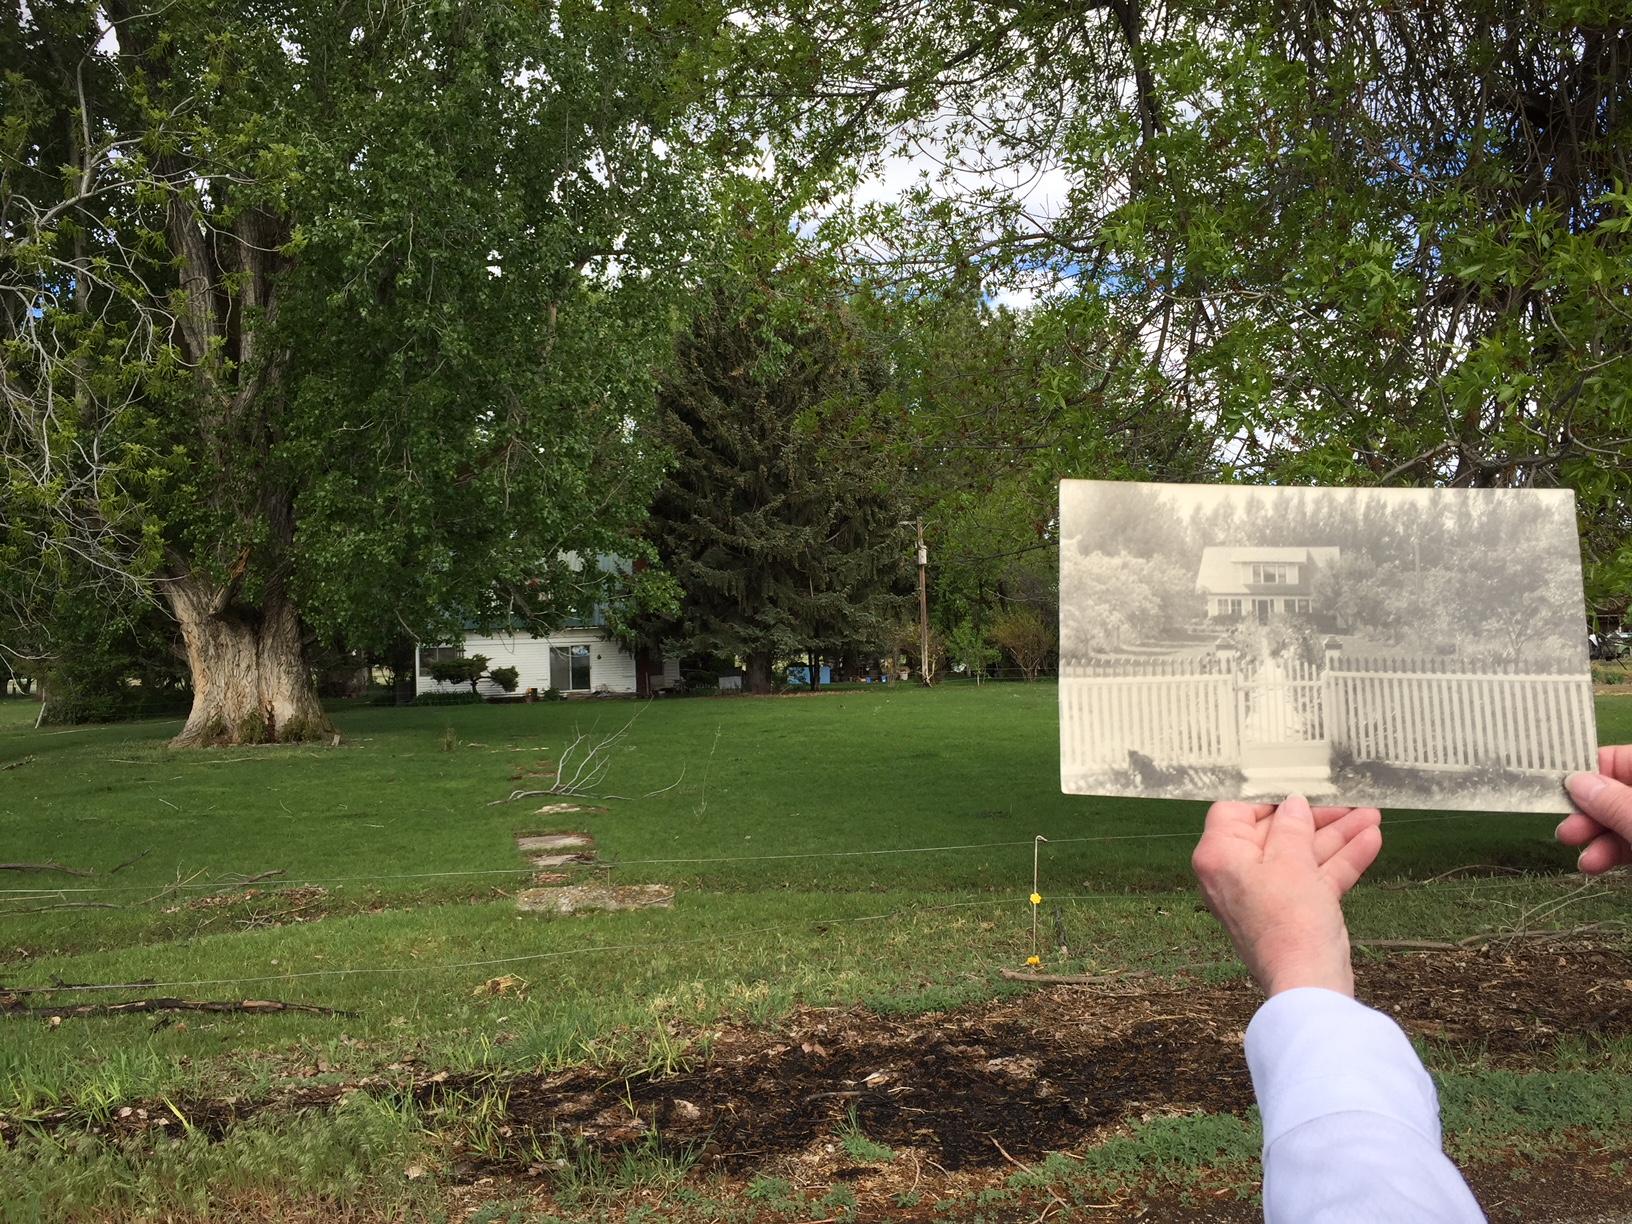 My great grandparents' farm, Rupert, Idaho circa 1918 and 2018.